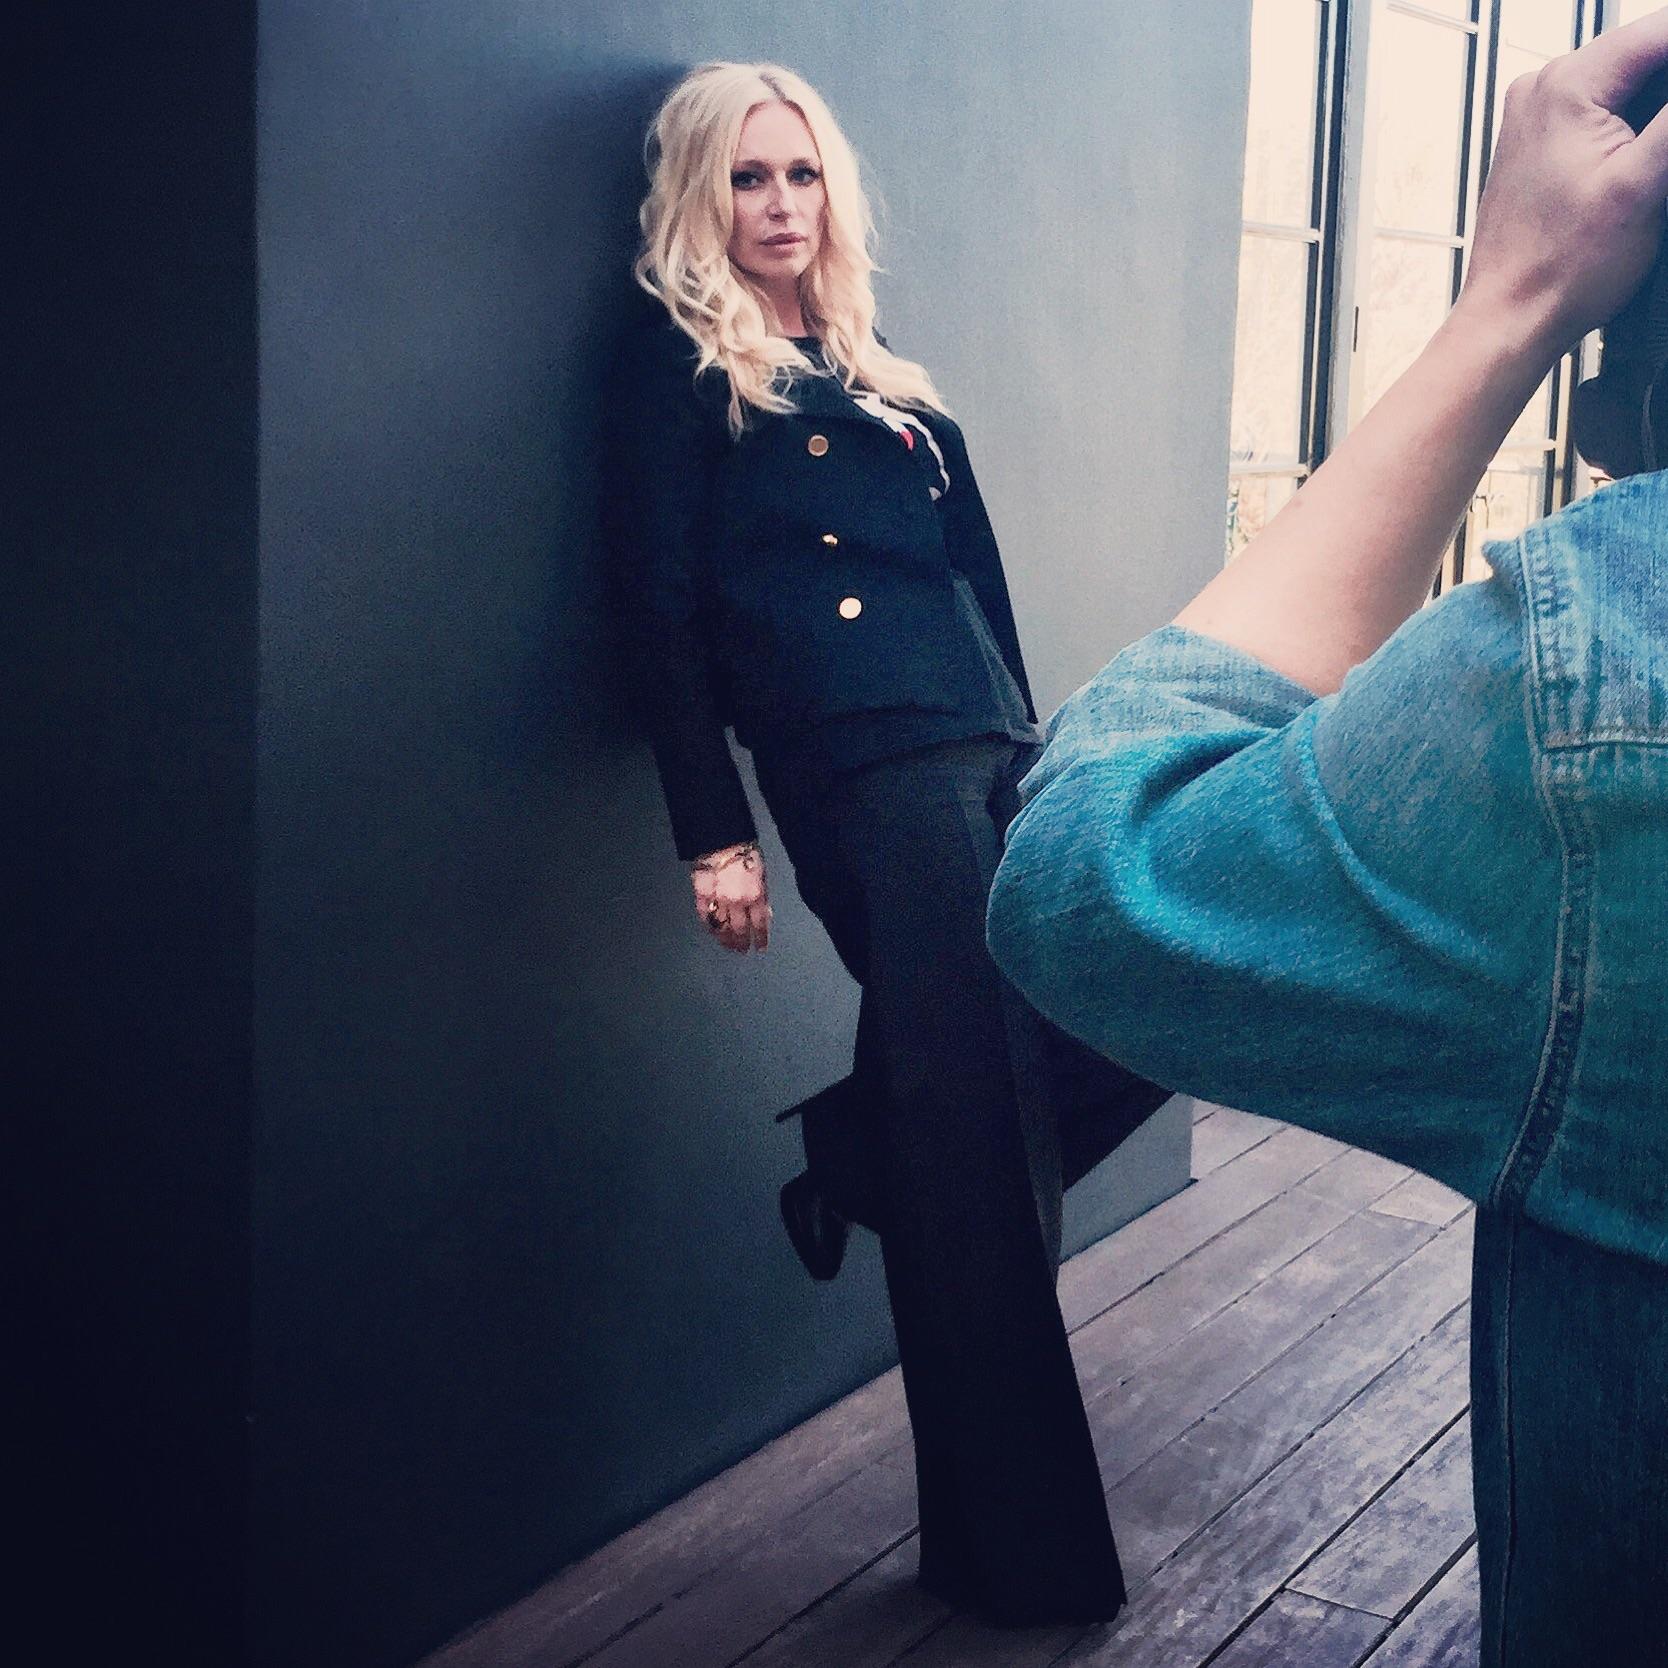 Photo shoot for ES magazine